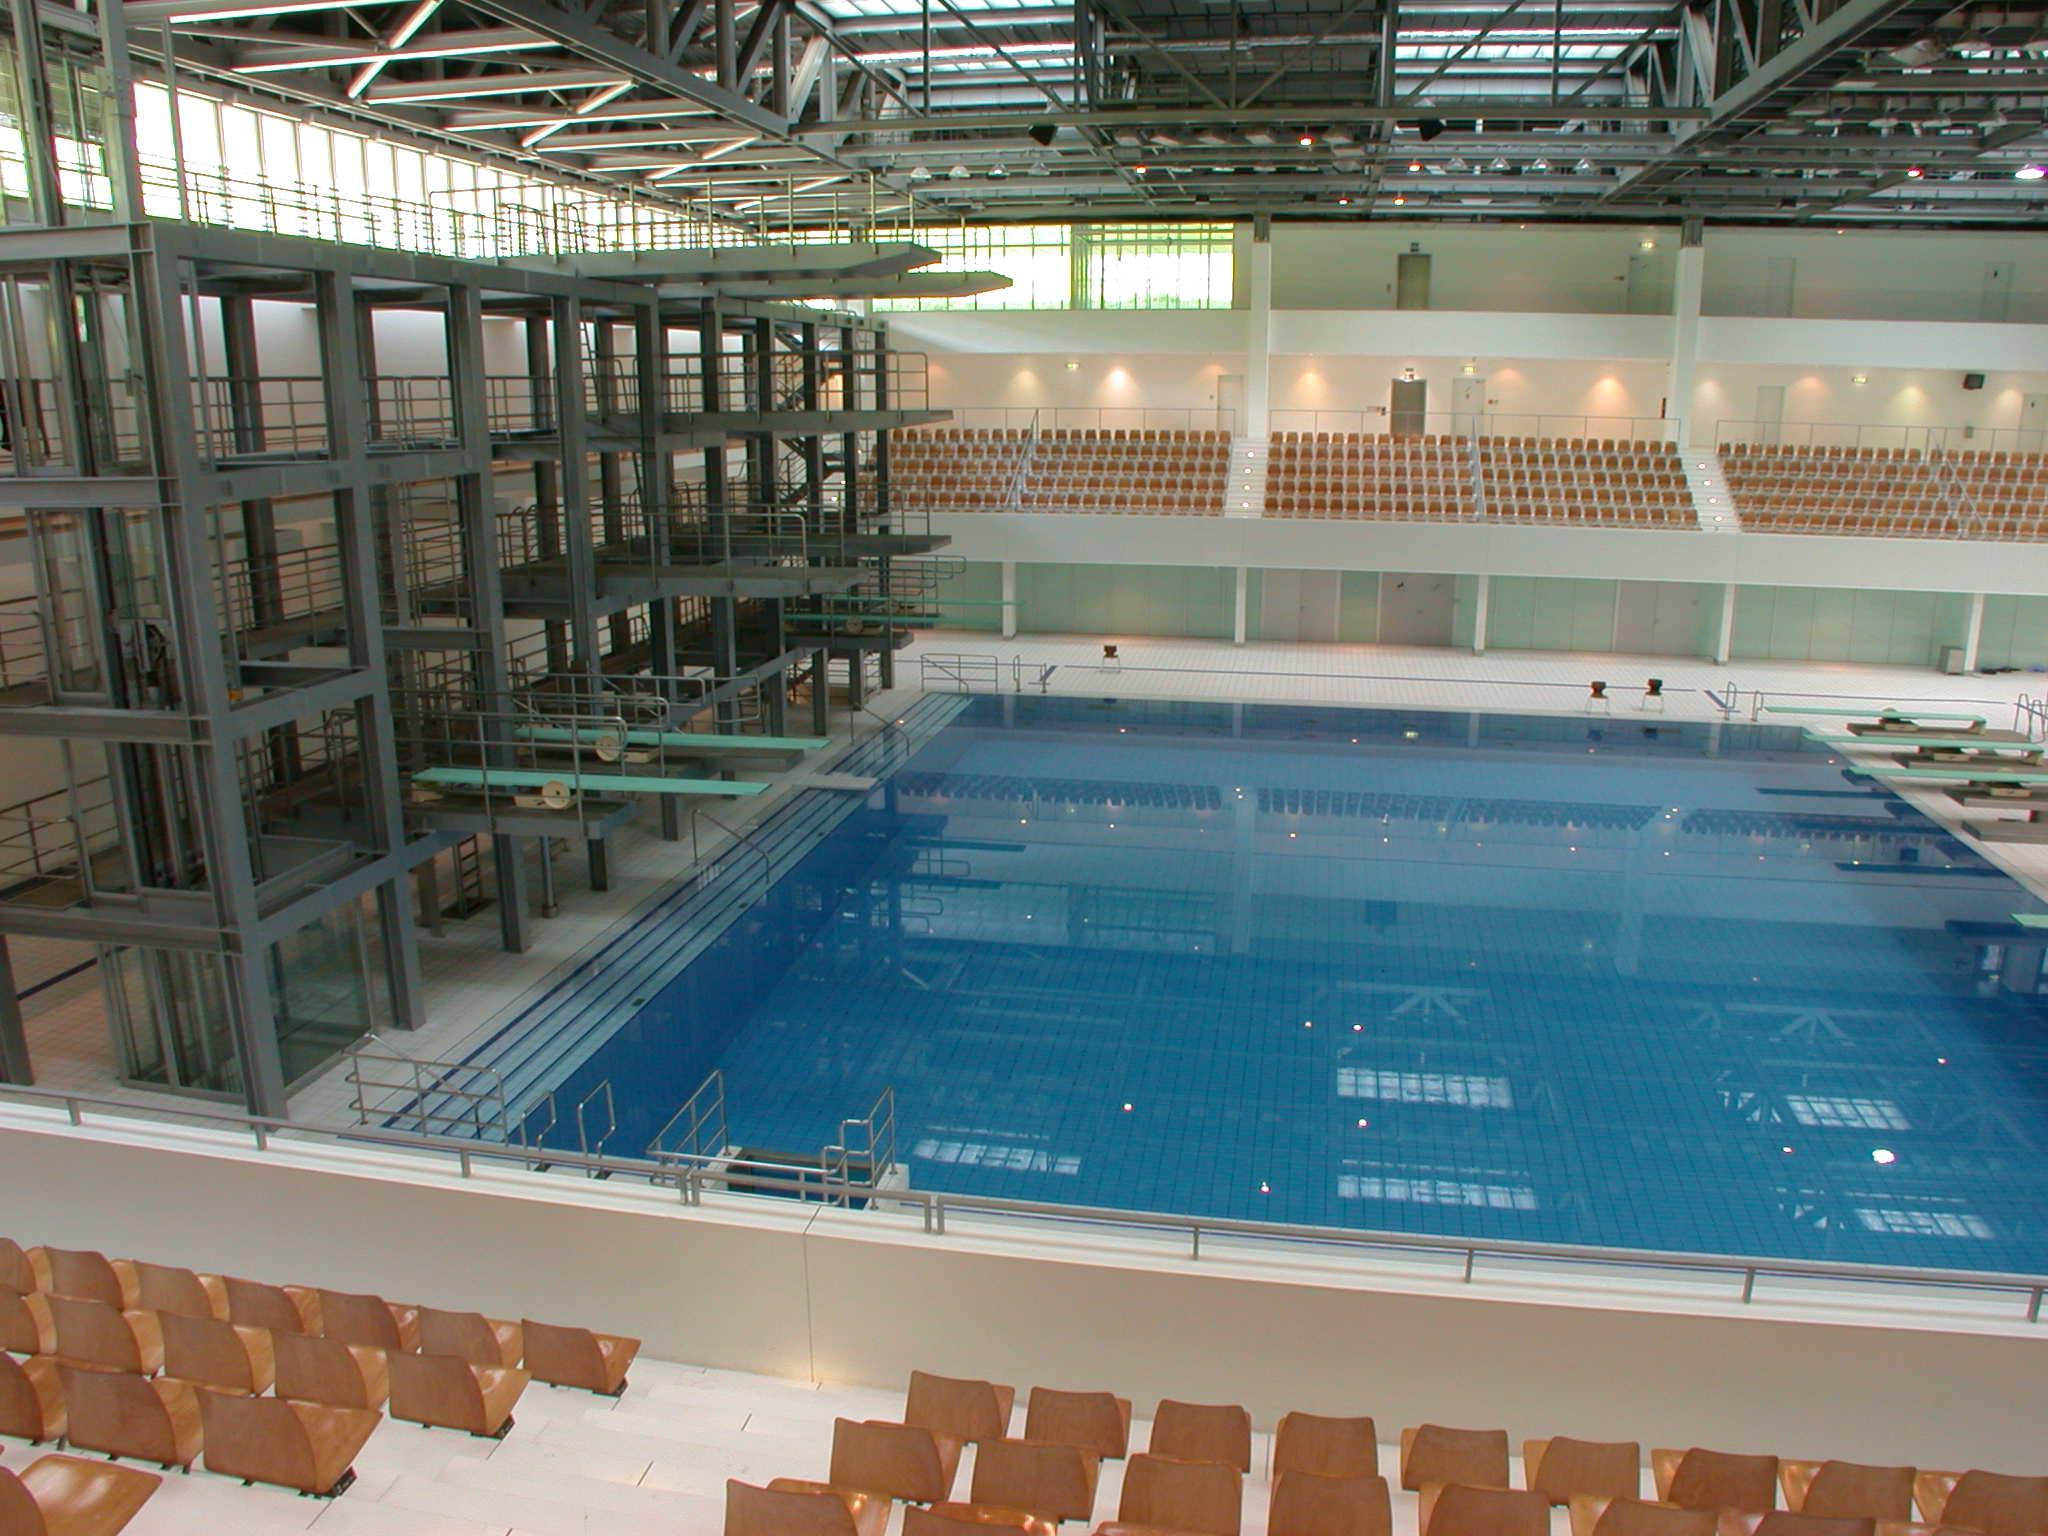 Hösbach Schwimmbad venue fina swimming cup 2017 berlin